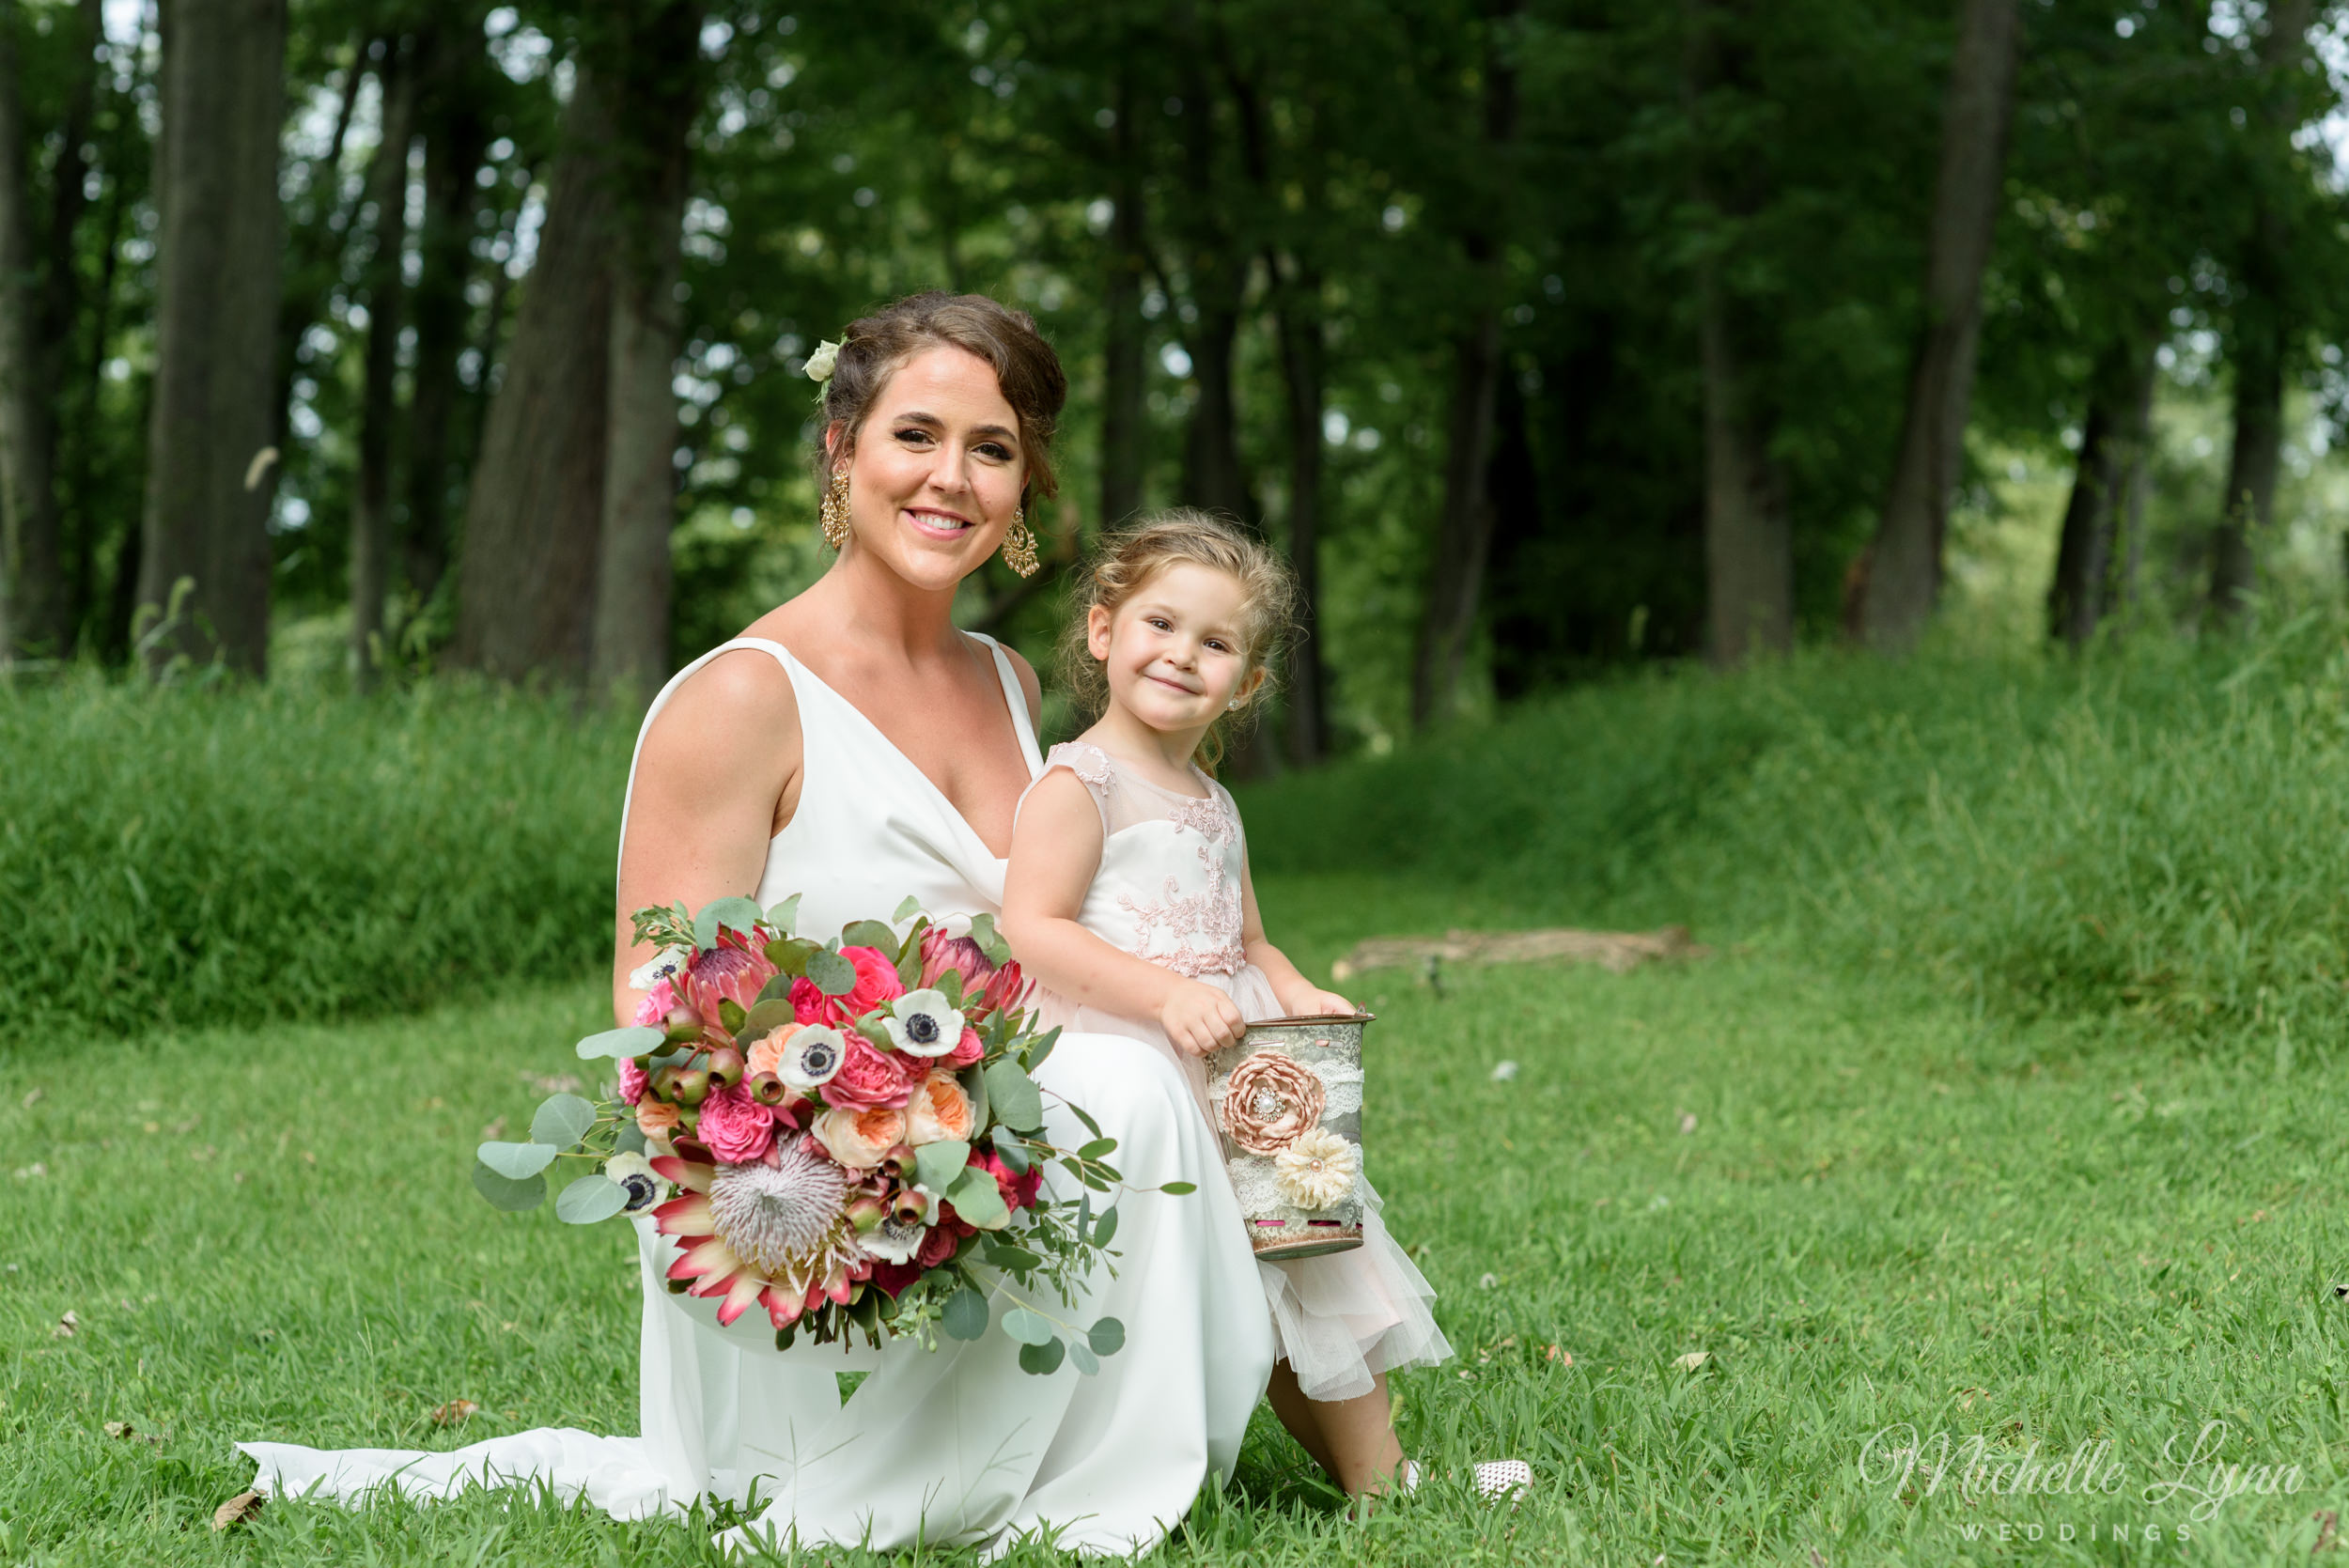 mlw-unionville-vineyards-nj-wedding-photography-52.jpg